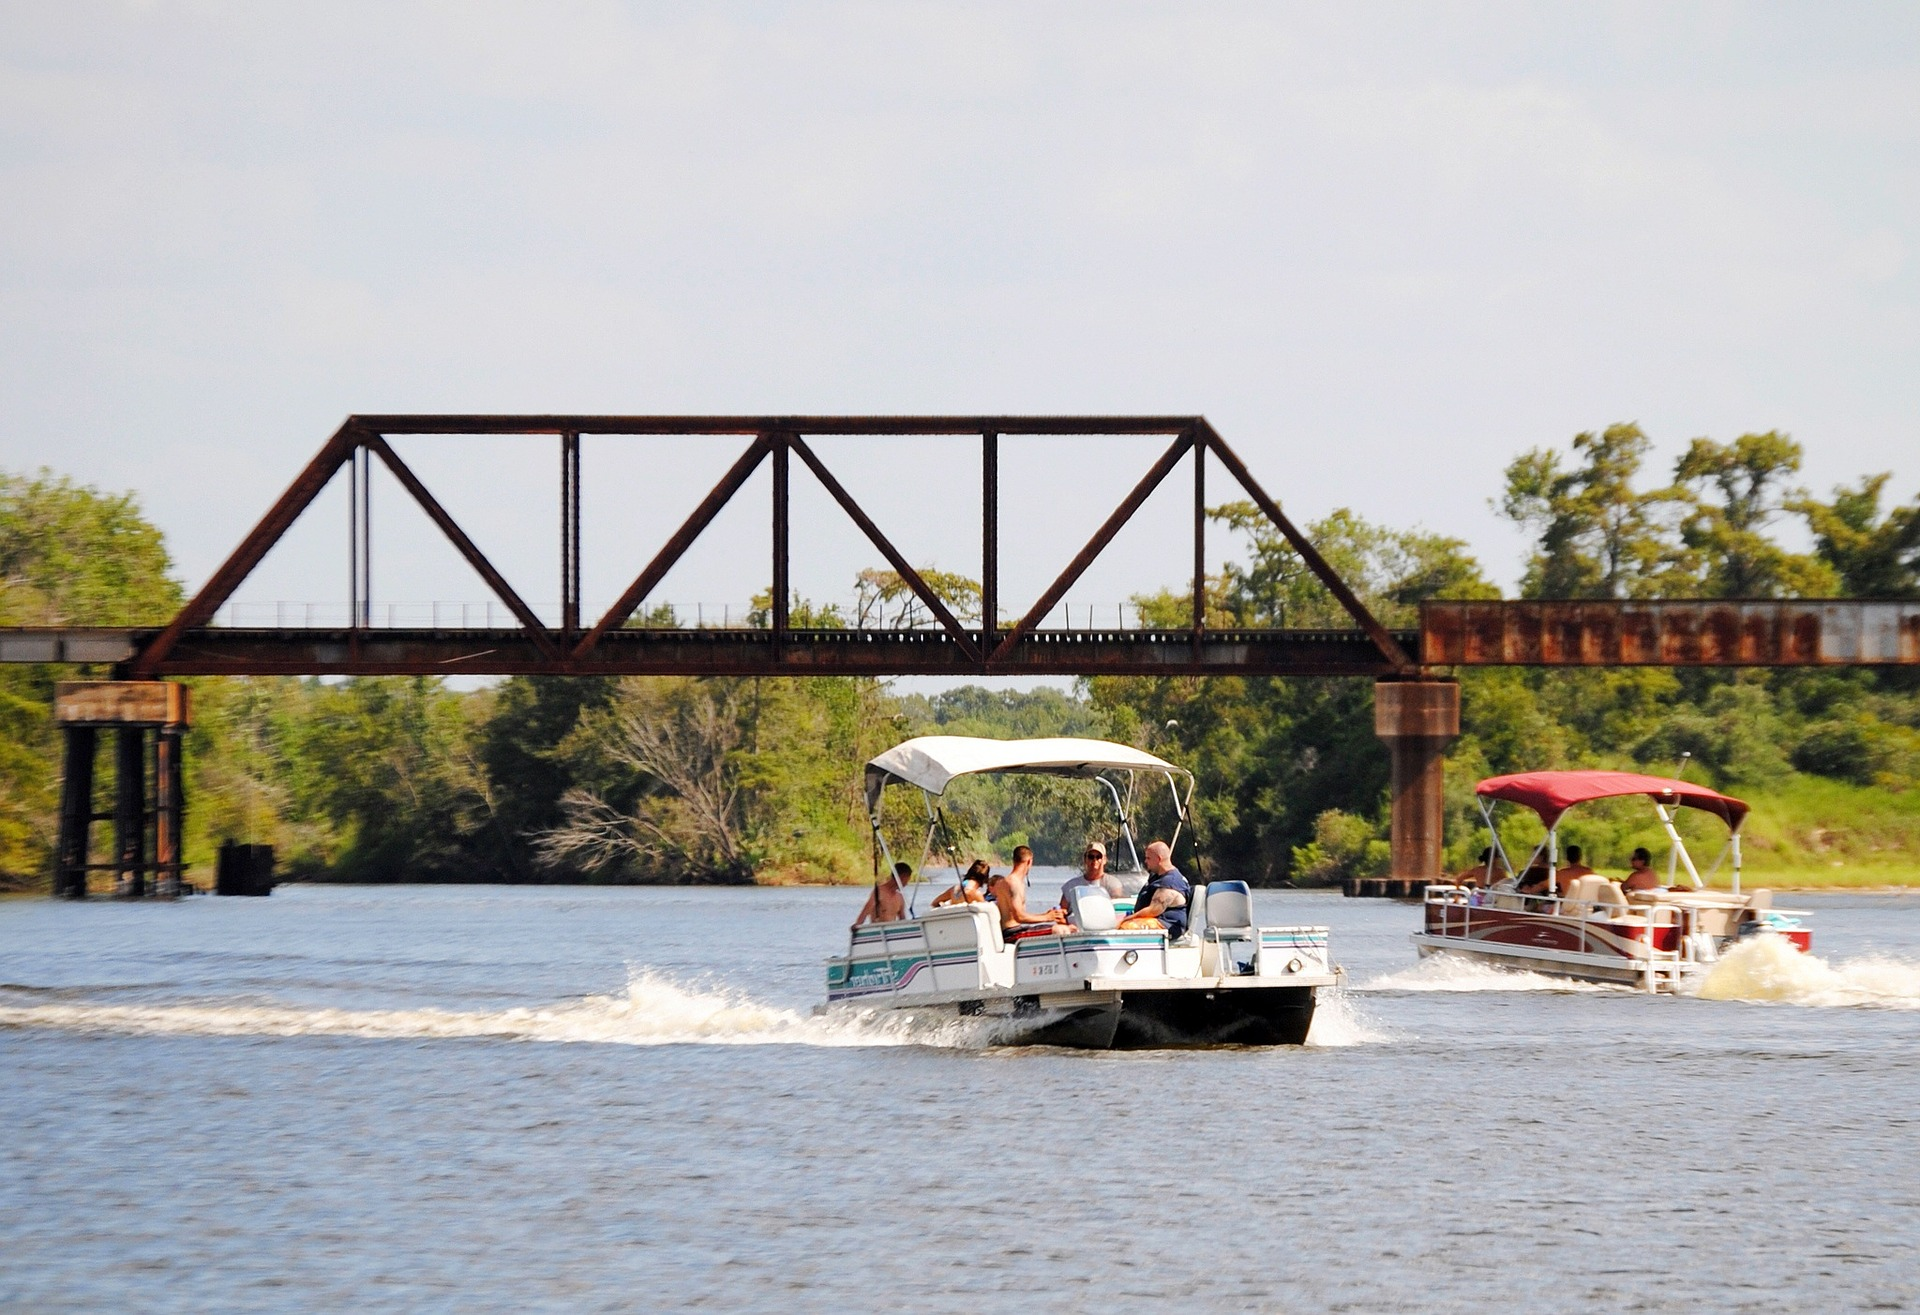 Two Pontoon Boats Rentals Cruising Under a Bridge